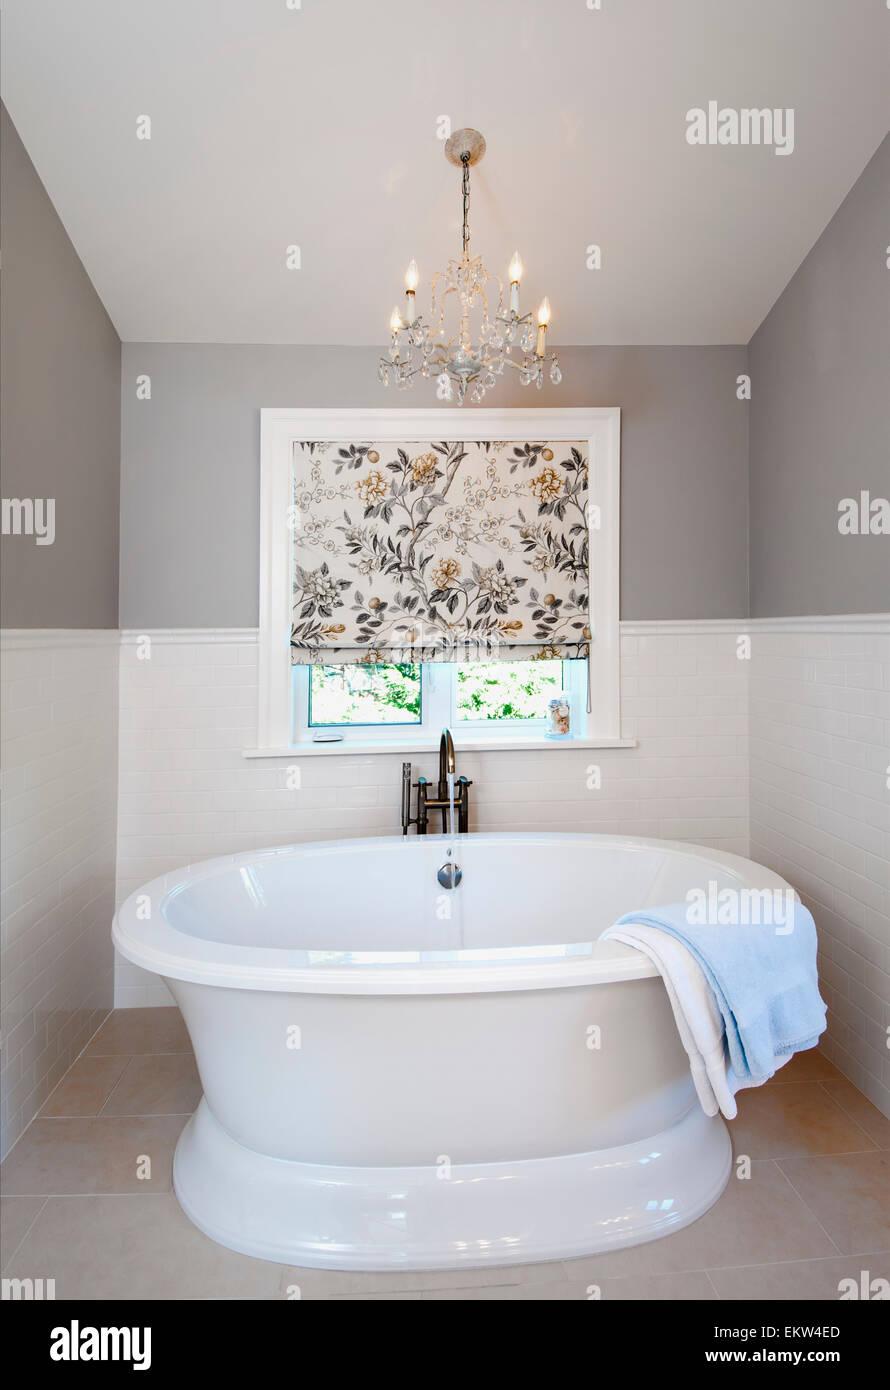 A Deep Soaker Bathtub In A Contemporary Bathroom Vancouver Island Stock Photo Alamy